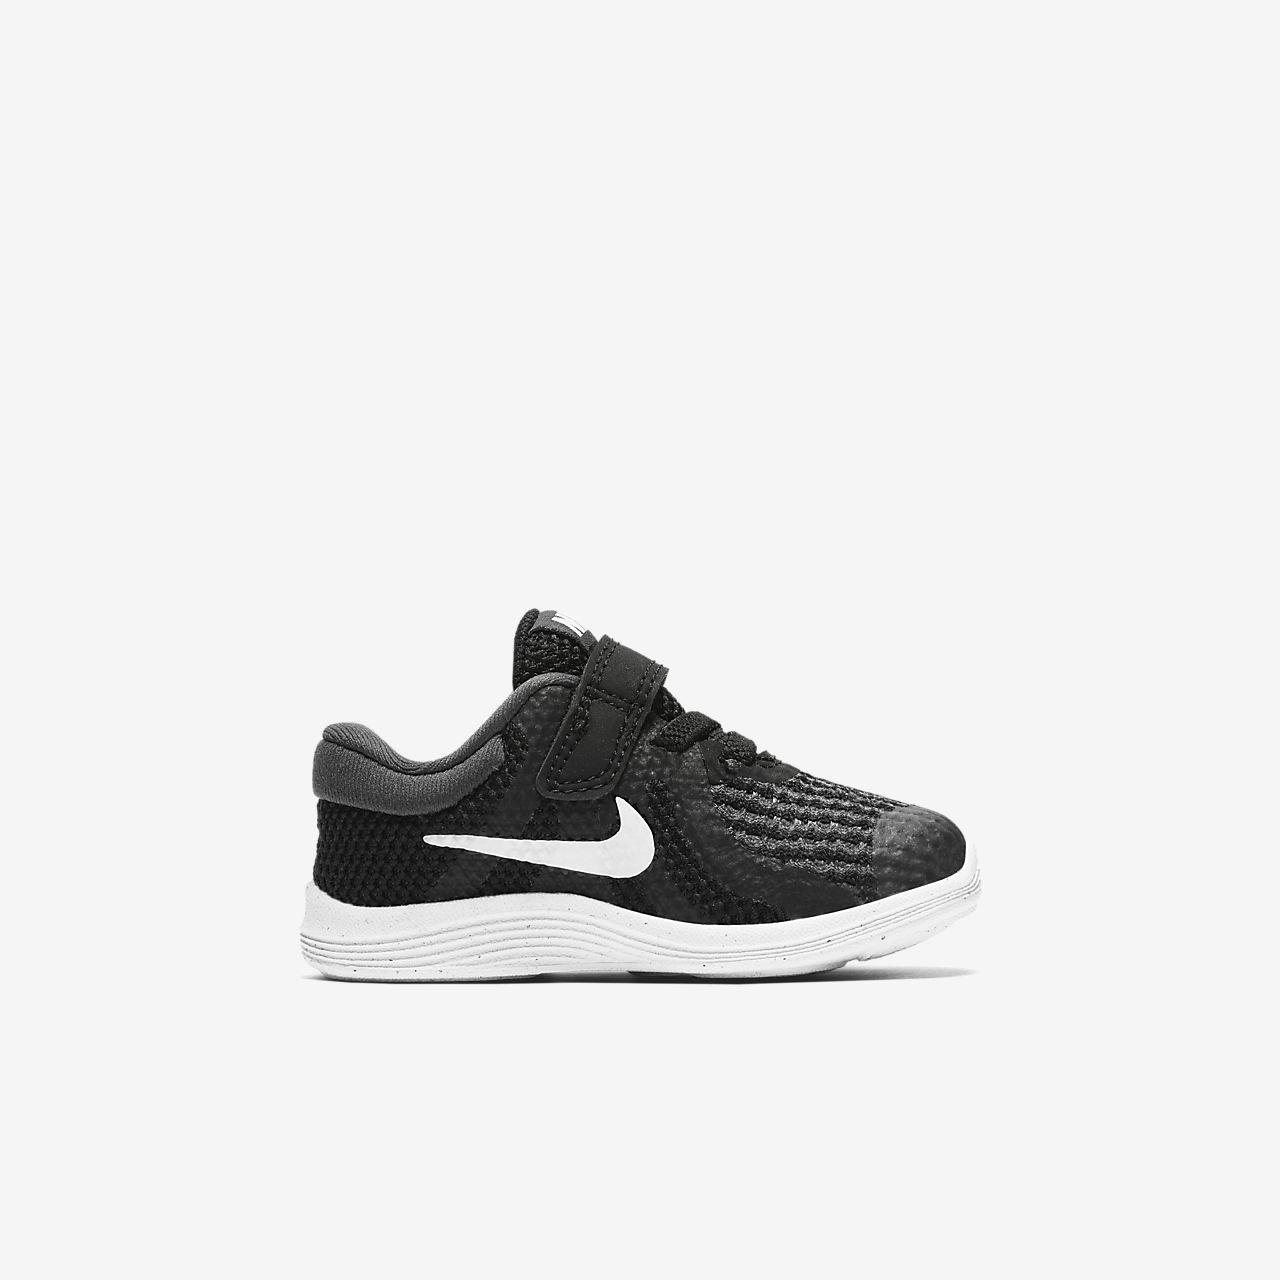 fdeb743a672c1 Nike Revolution 4 Baby   Toddler Shoe. Nike.com GB